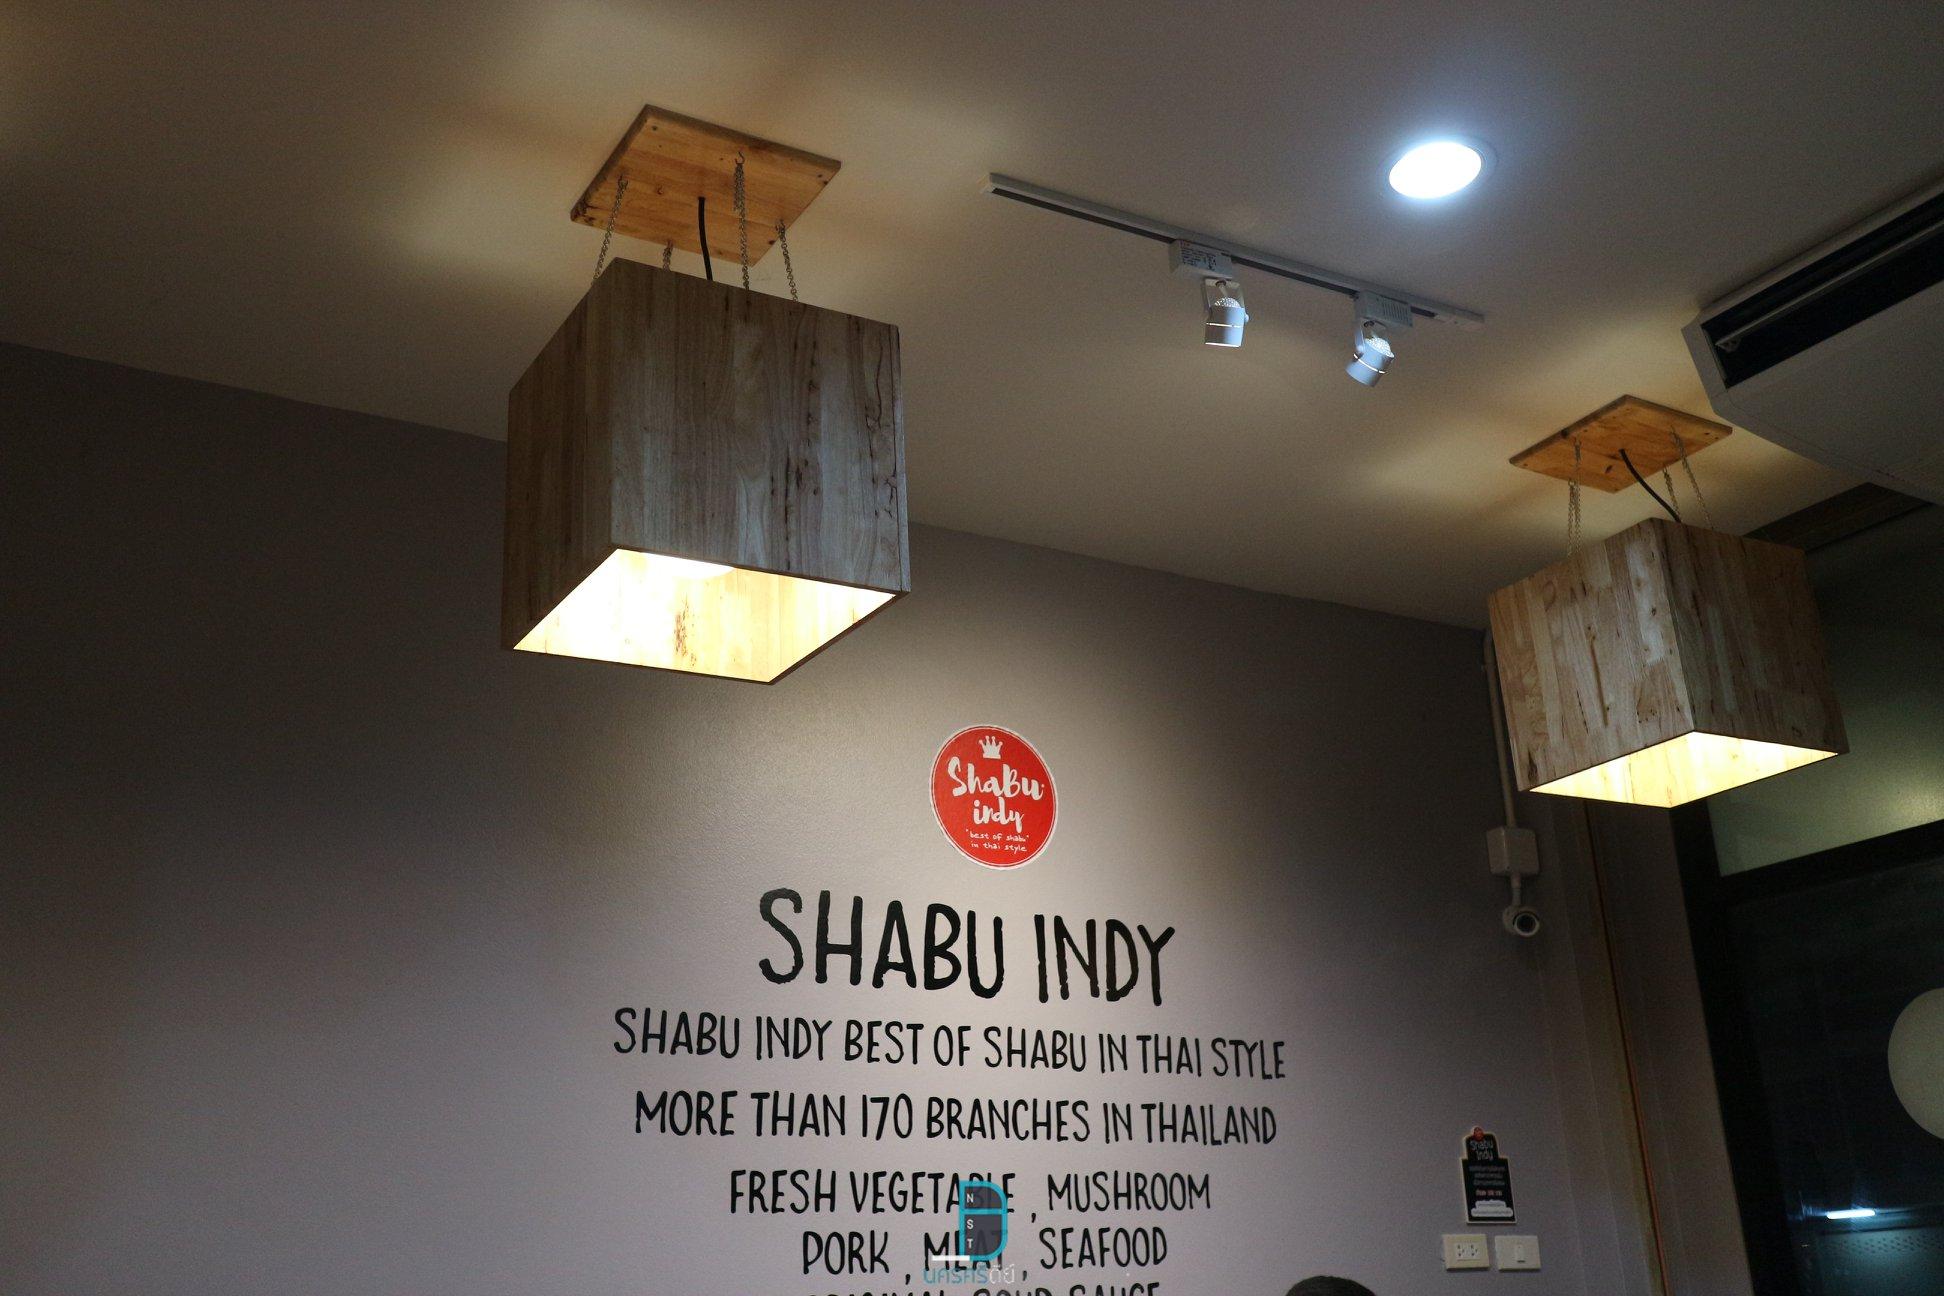 Shabu Indy ชาบูอินดี้กับ 5 น้ำจิ้มเด็ด at นครศรีธรรมราช นครศรีดีย์